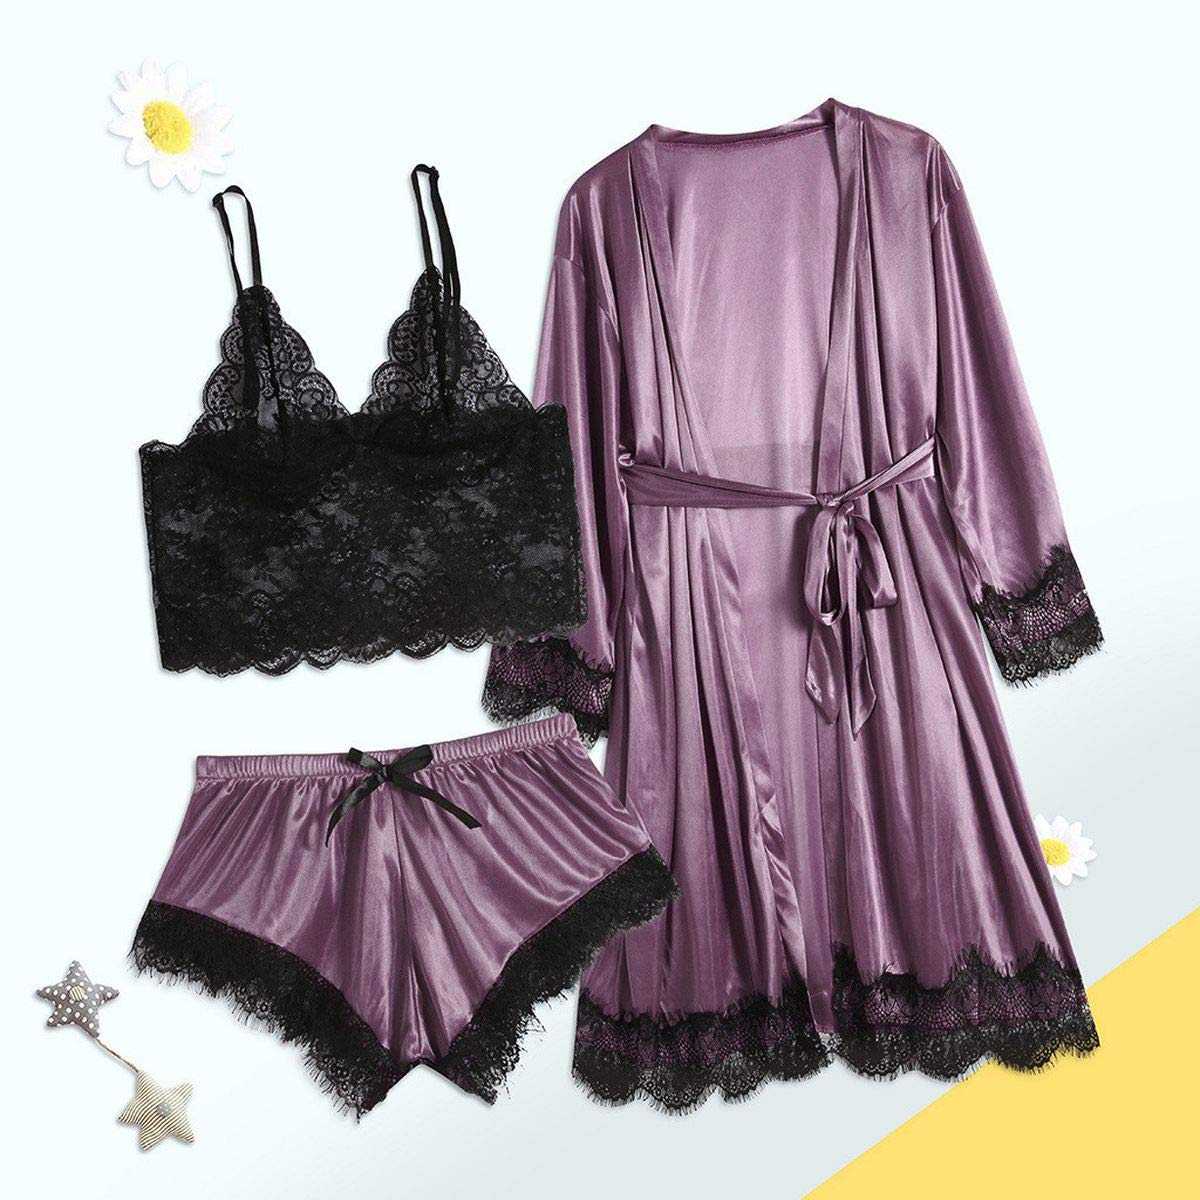 Lace Bra Short Underwear Satin Full Sleeve Robe Nightgown Set Sleepwear Nightwear Pyjamas Belt Womens Pajama Set